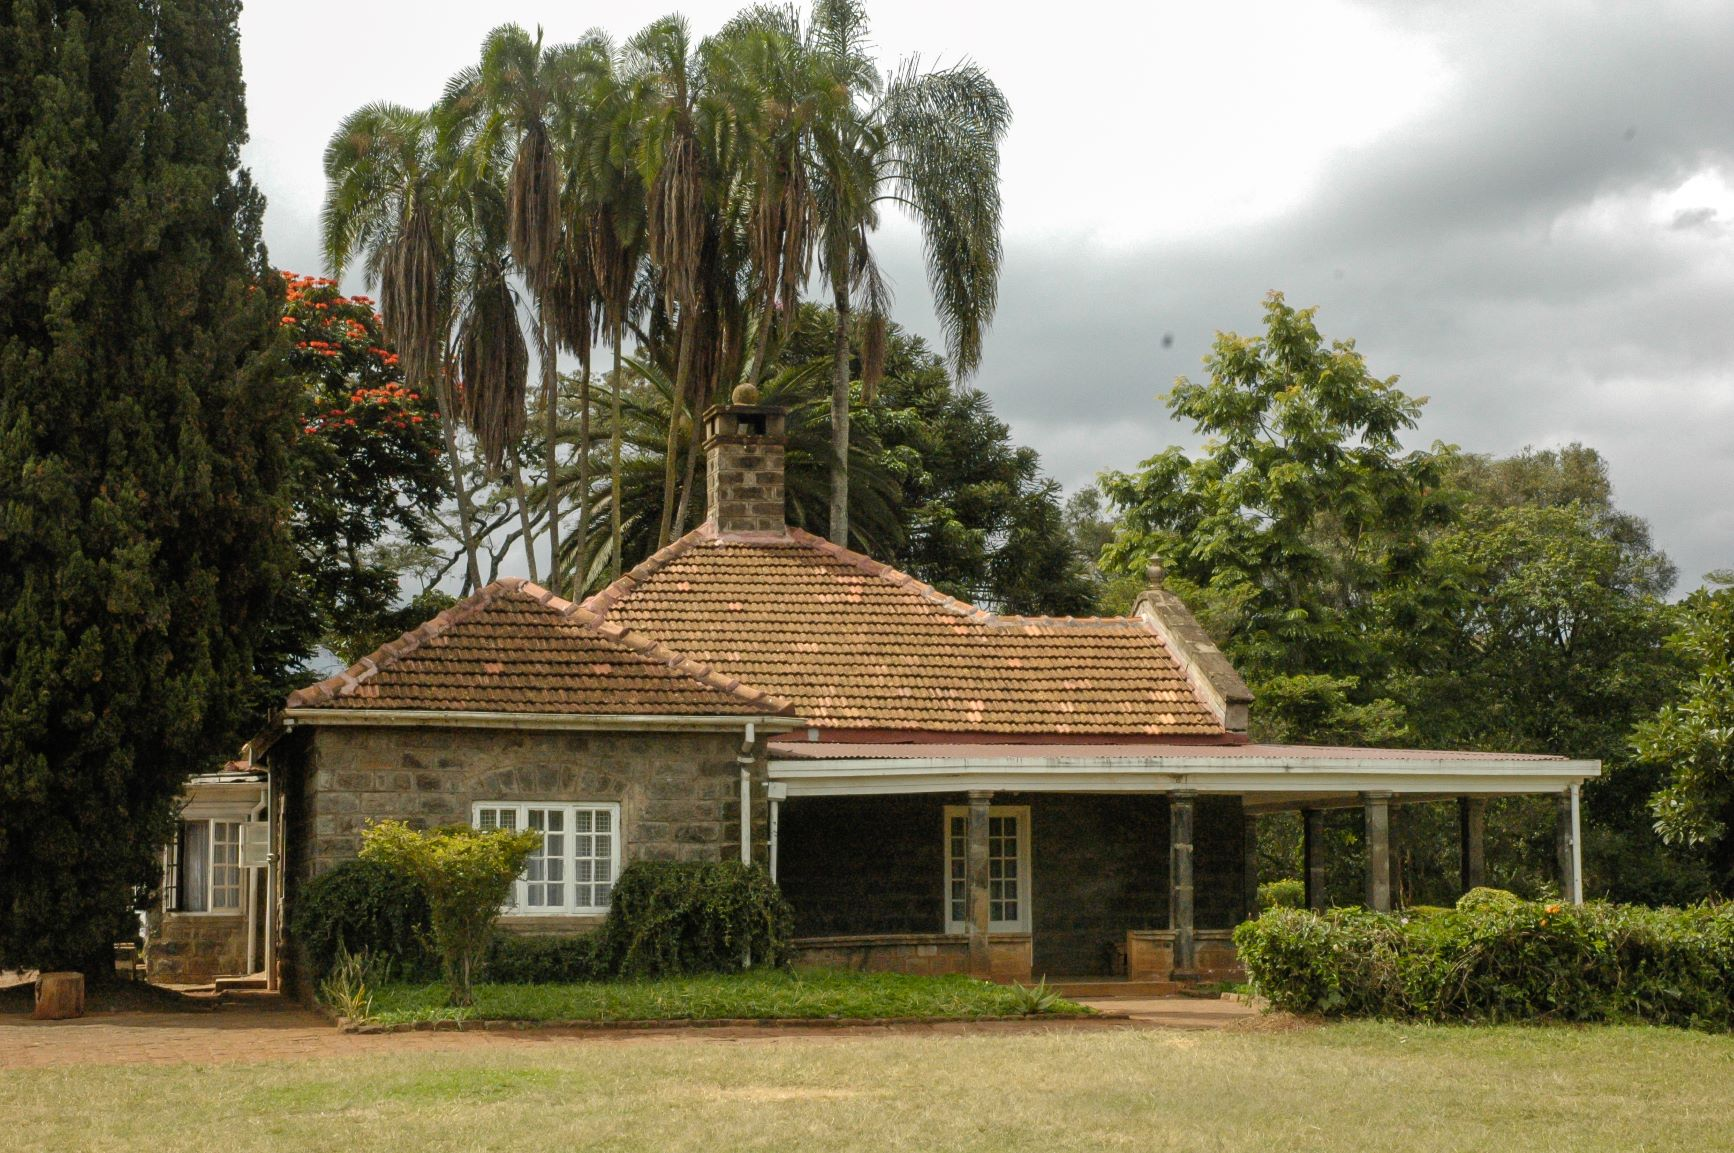 https://bubo.sk/uploads/galleries/16290/karen_blixen_museum_in_nairobi_kenya_02a.jpg